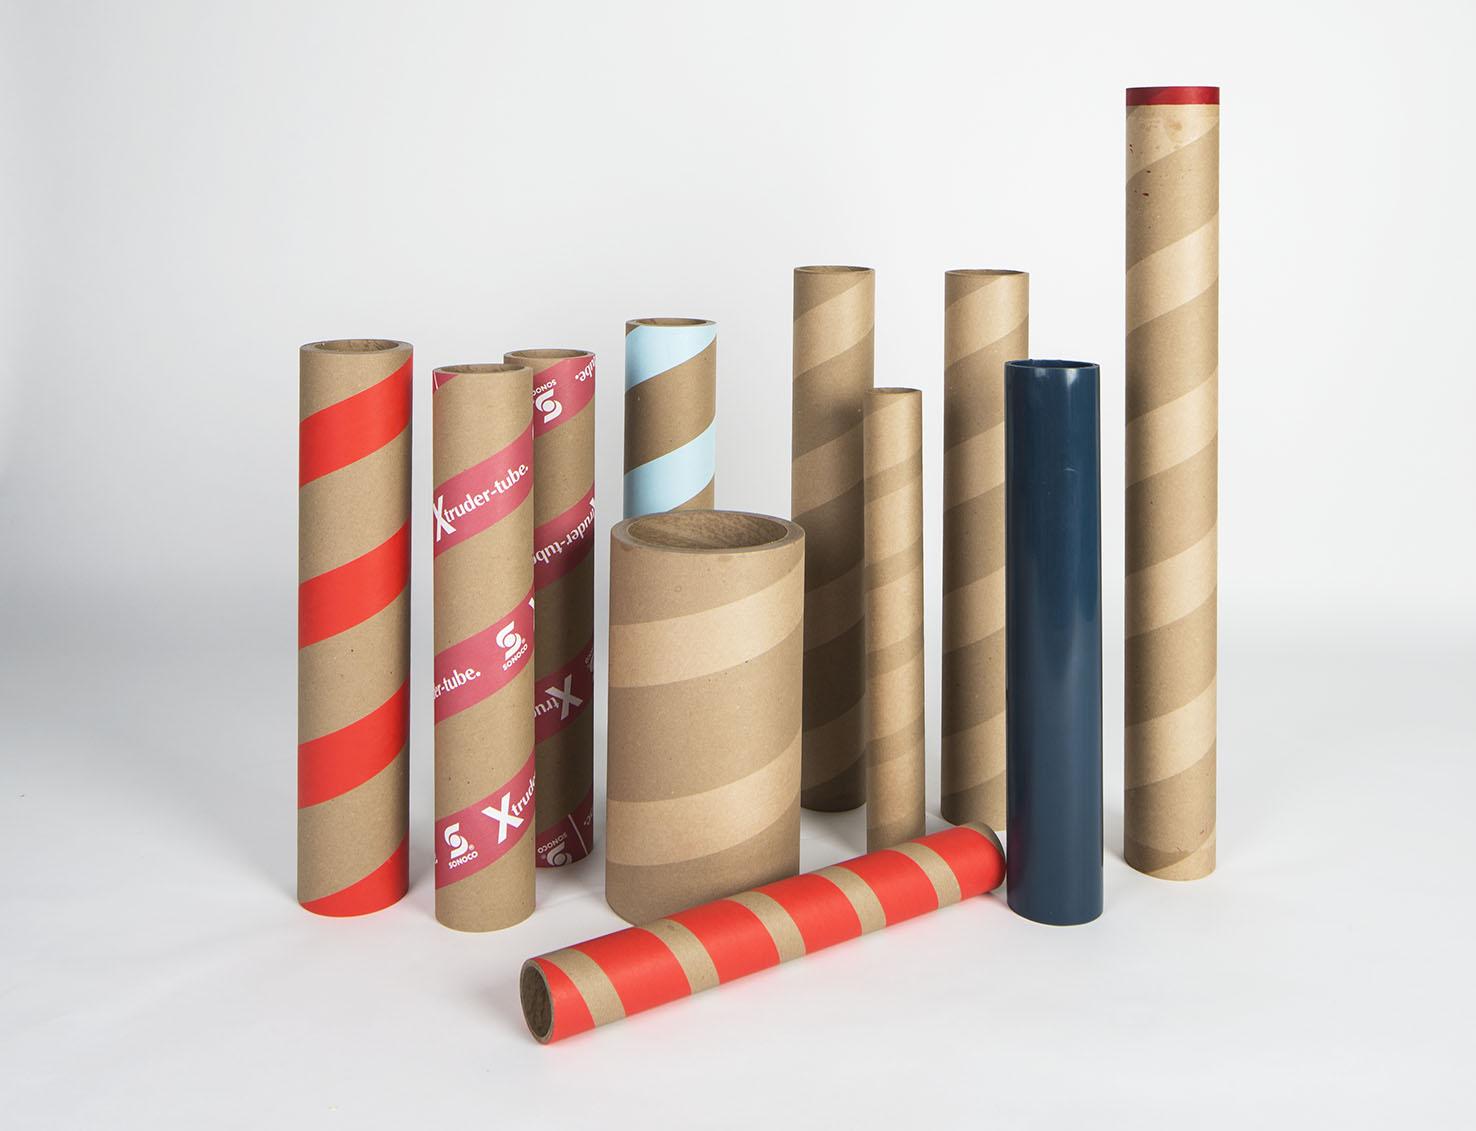 Industrial cardboard cores